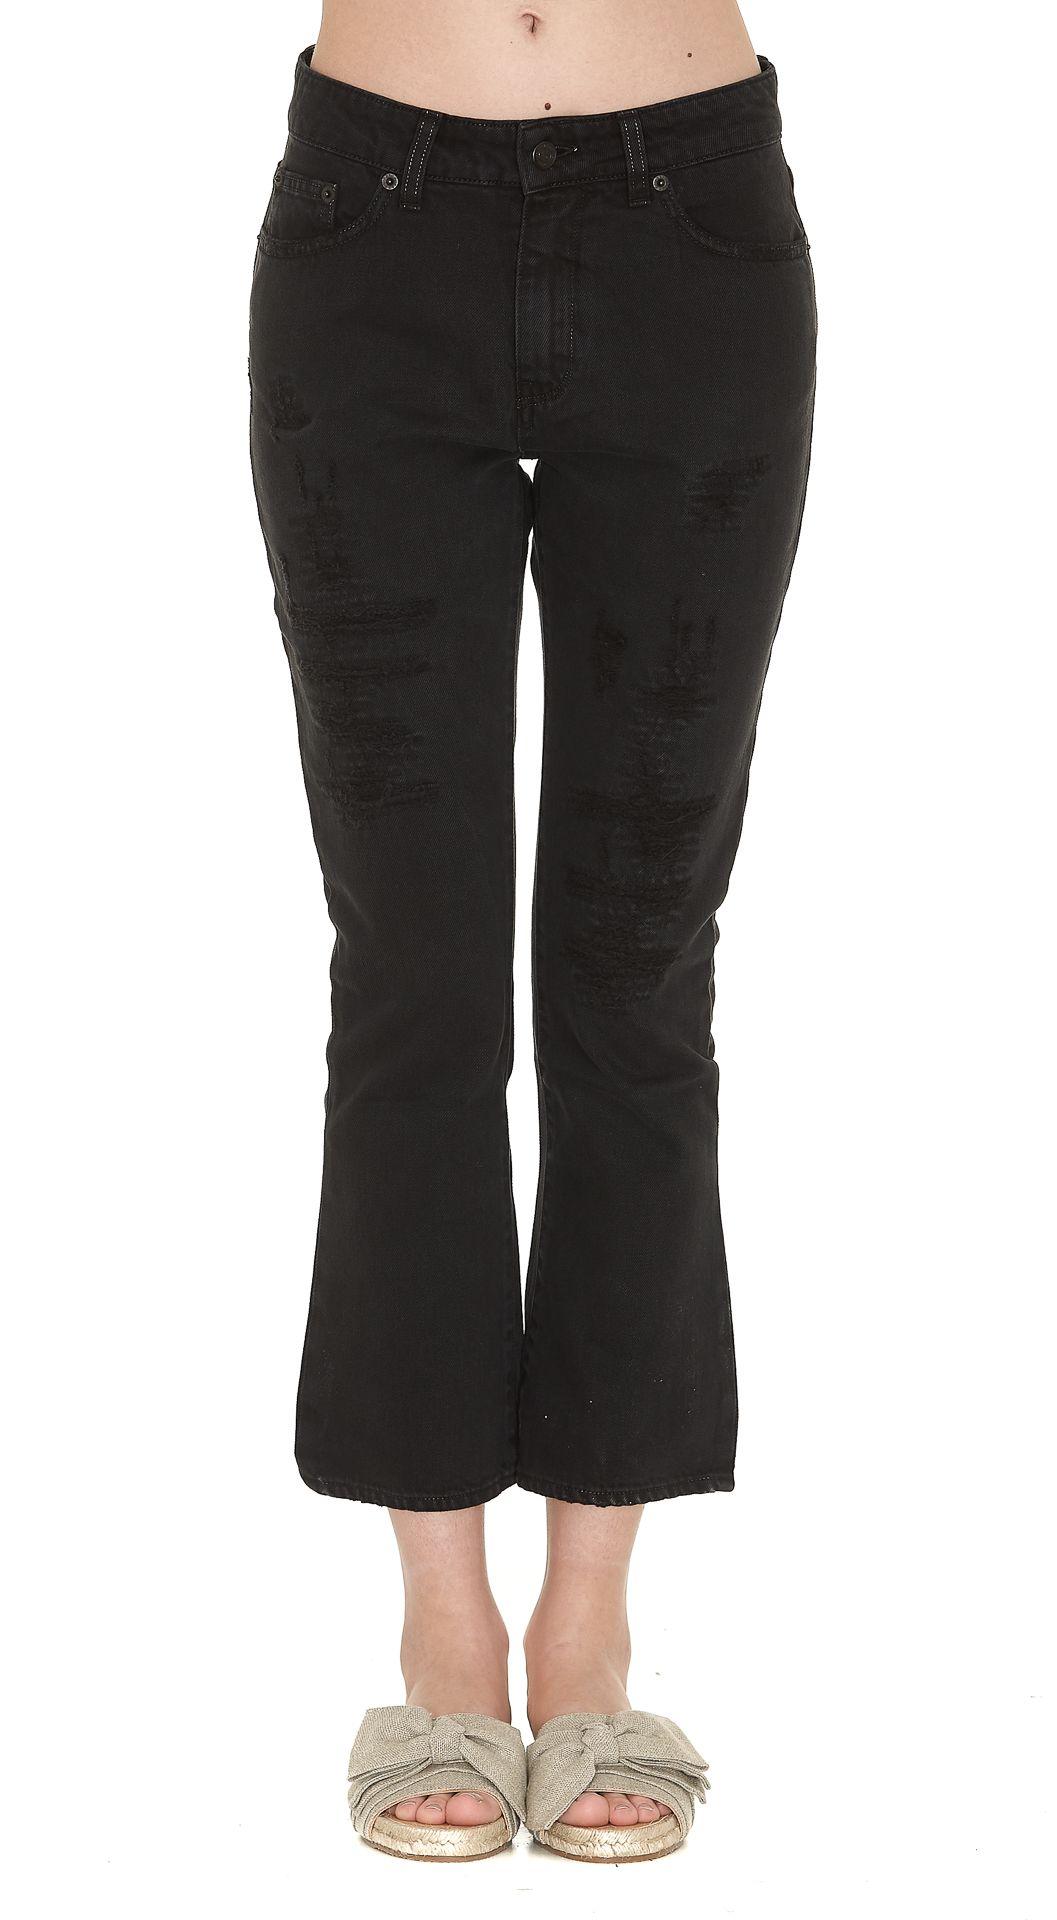 Department 5 Clar Jeans 10552453